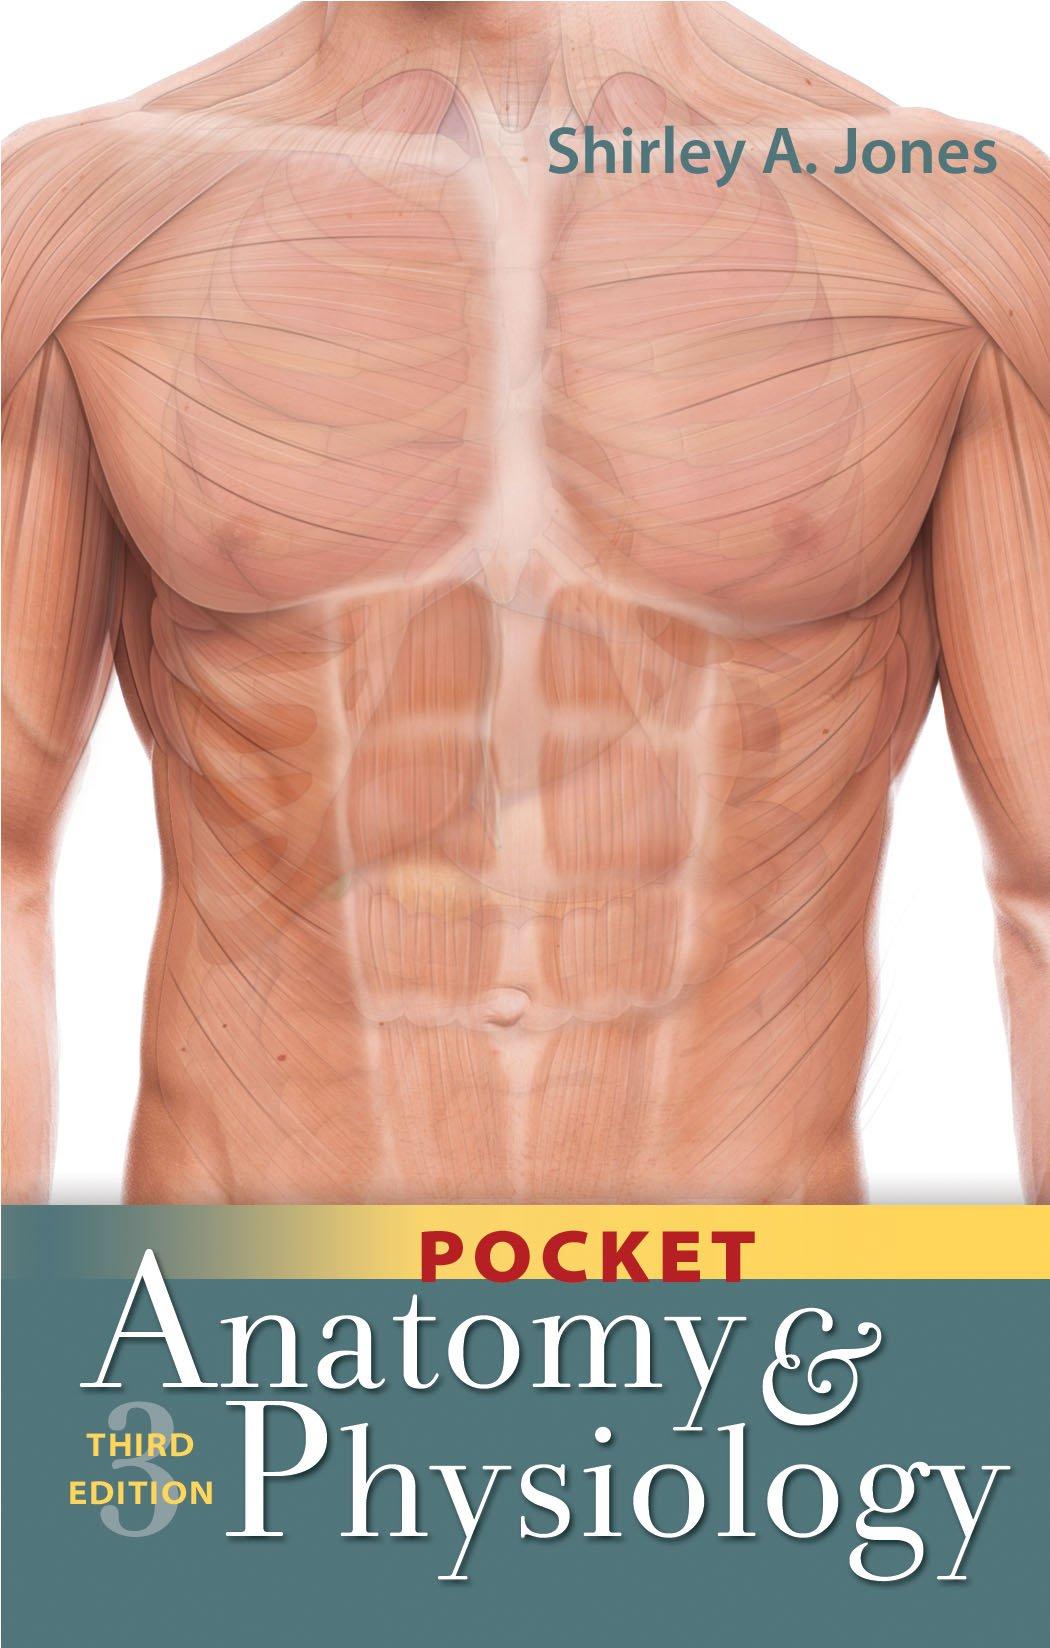 Pocket Anatomy and Physiology: Amazon.co.uk: Shirley A Jones ...